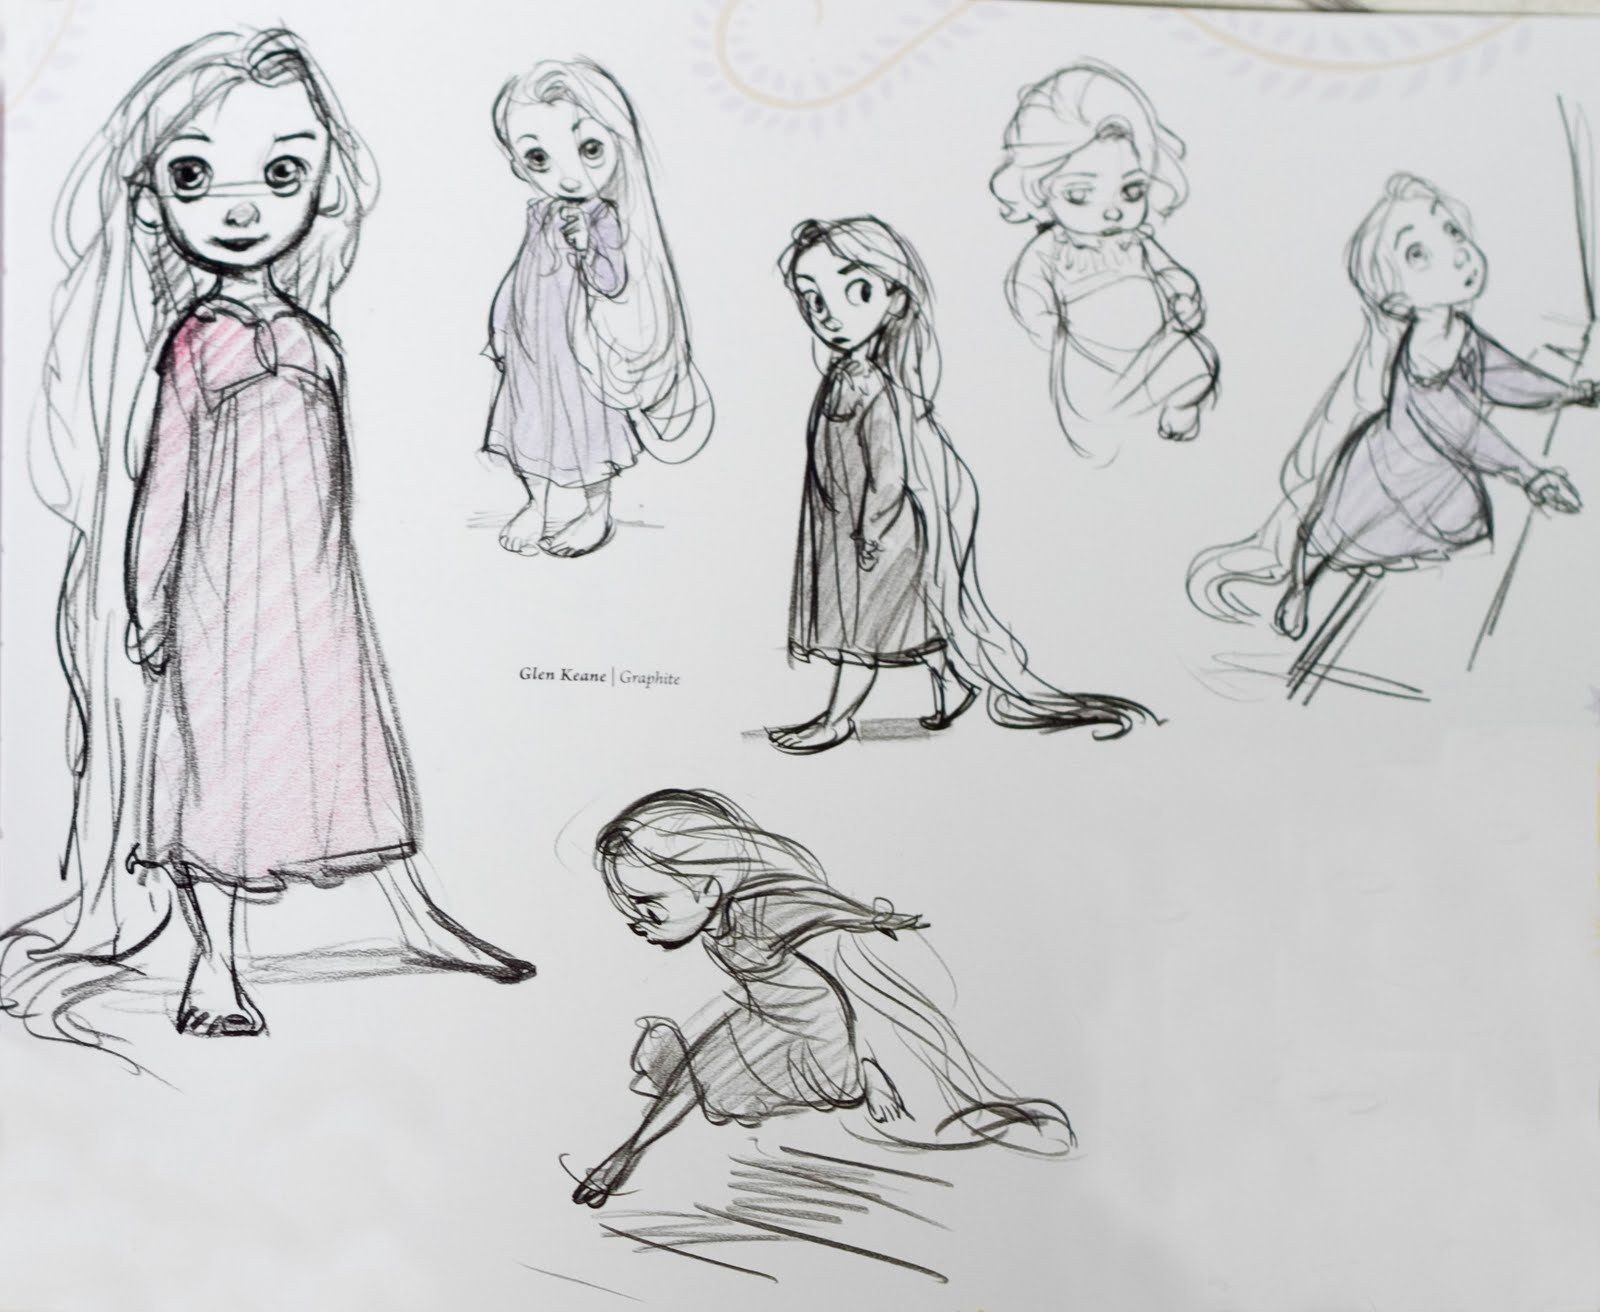 Little-Rapunzel-Concept-Art-disney-princess-18028371-1600